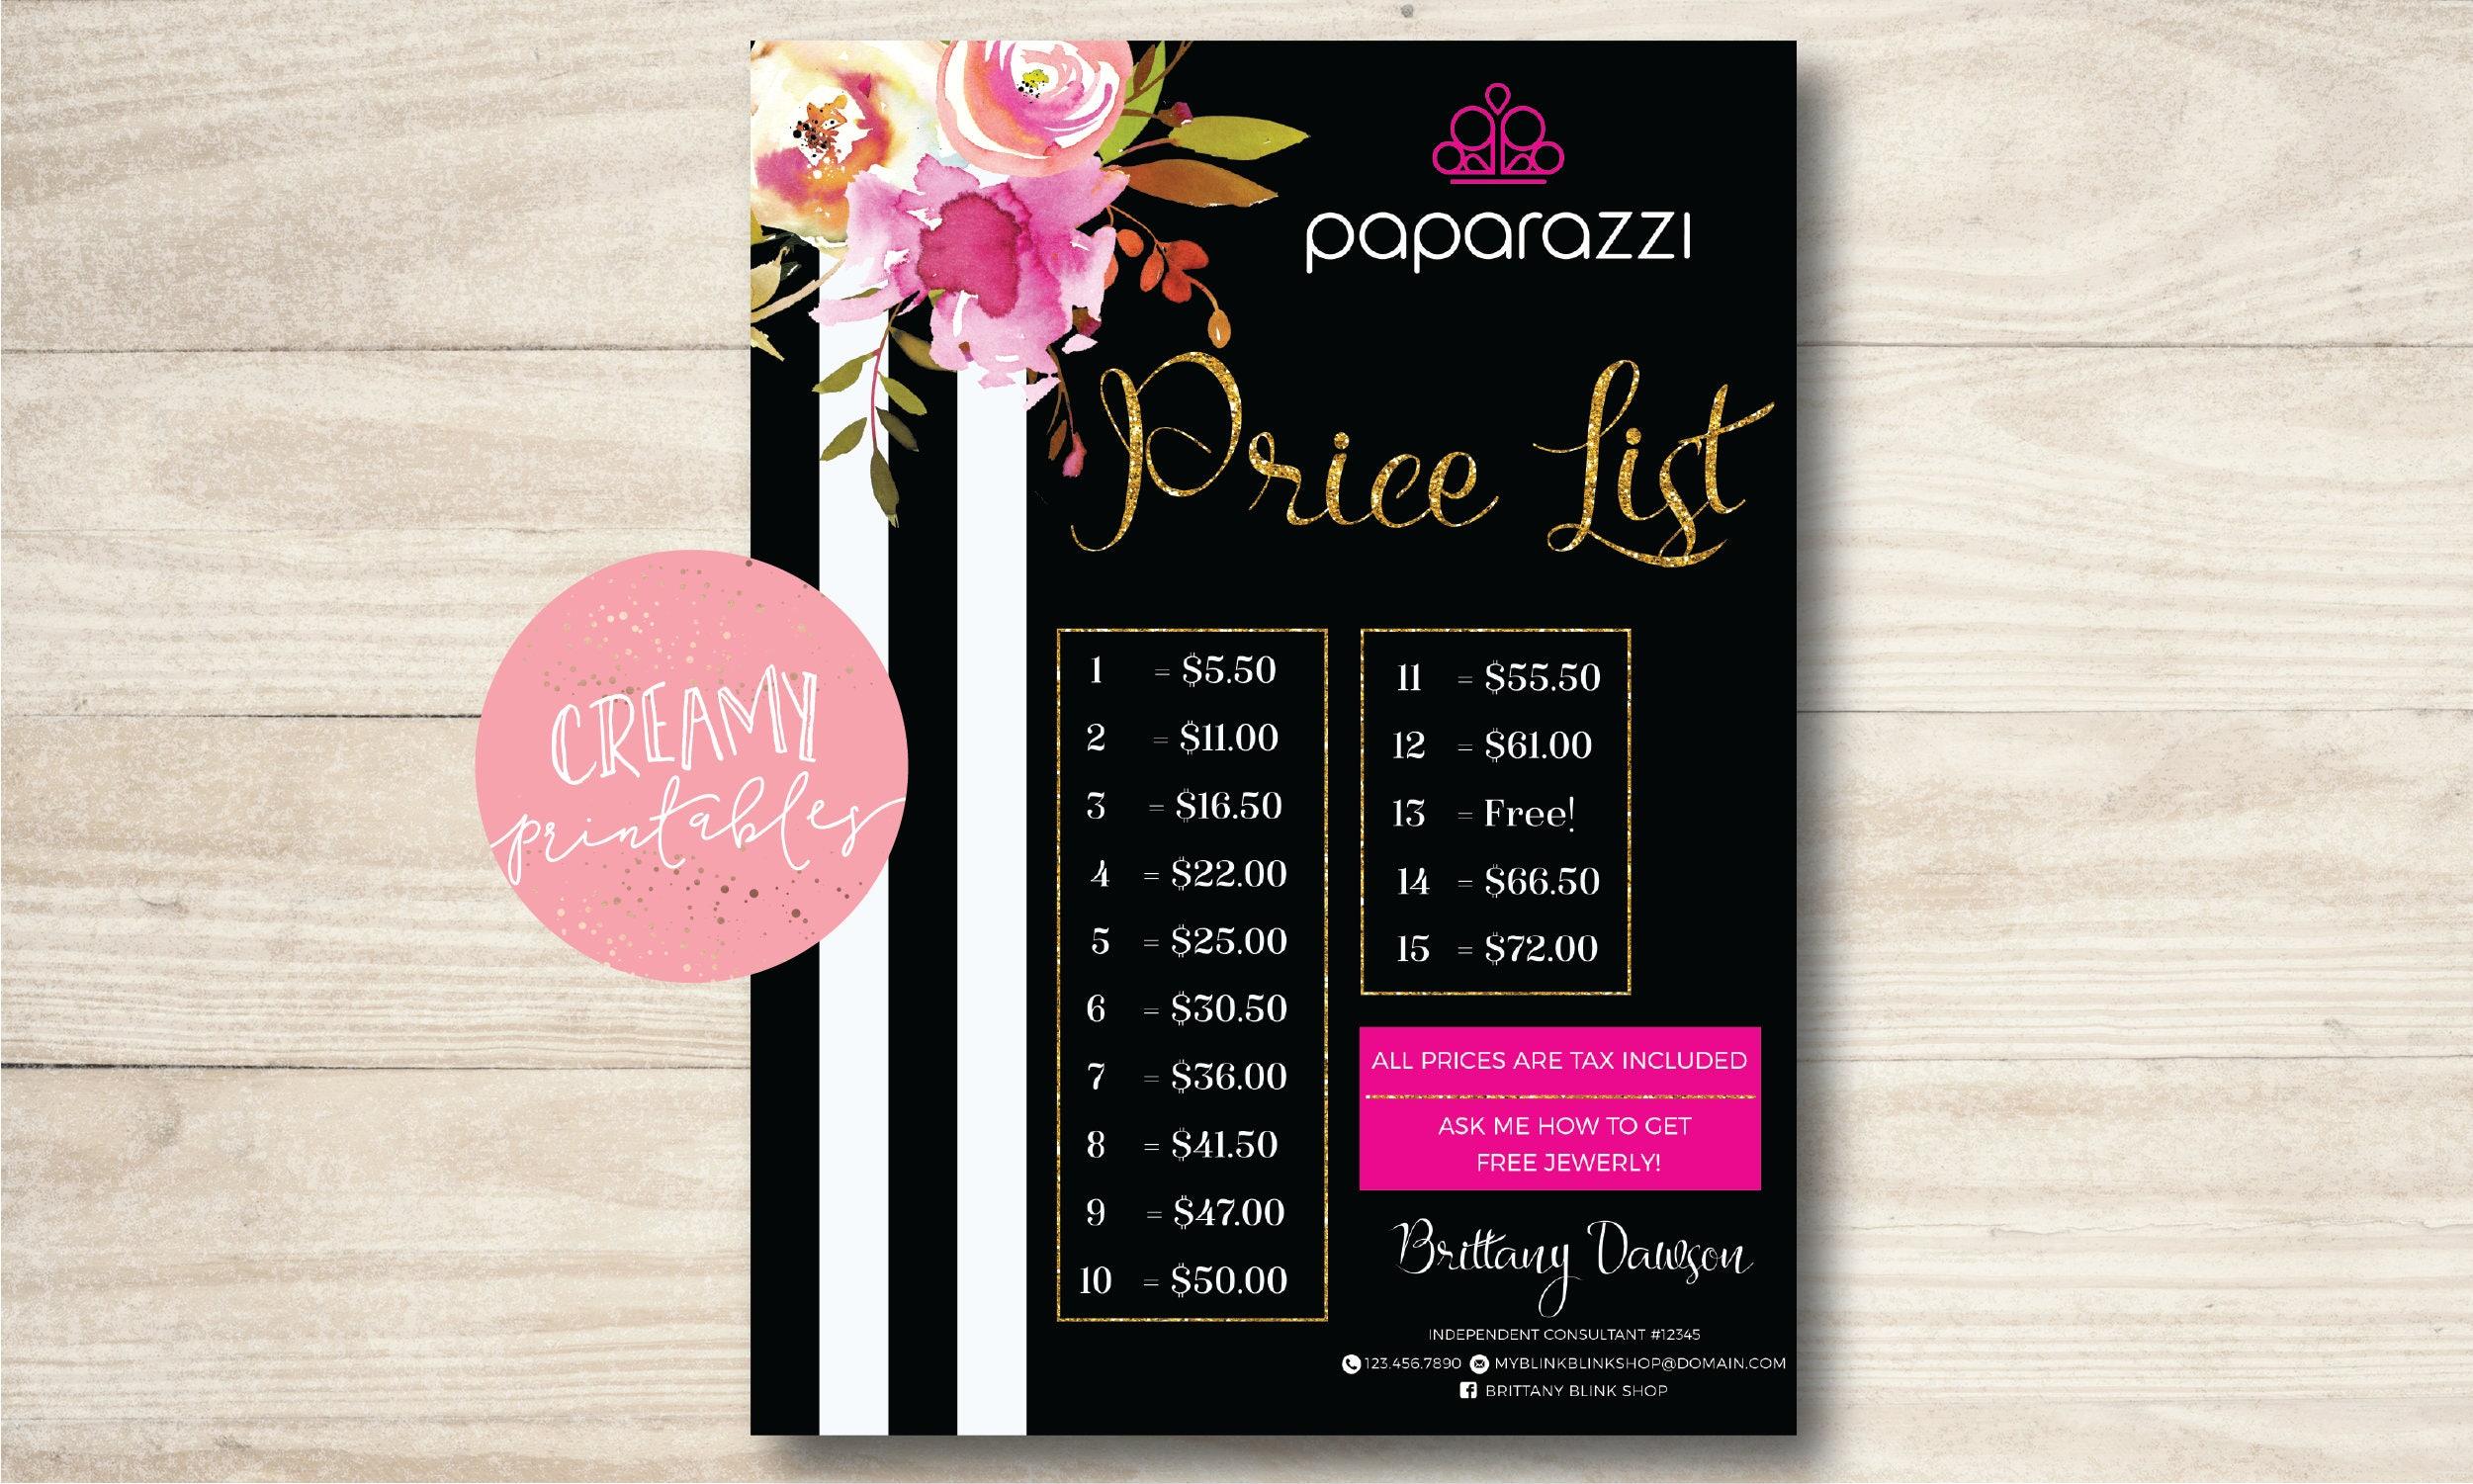 Paparazzi Jewelry Price List Poster Free Personalized 18x24